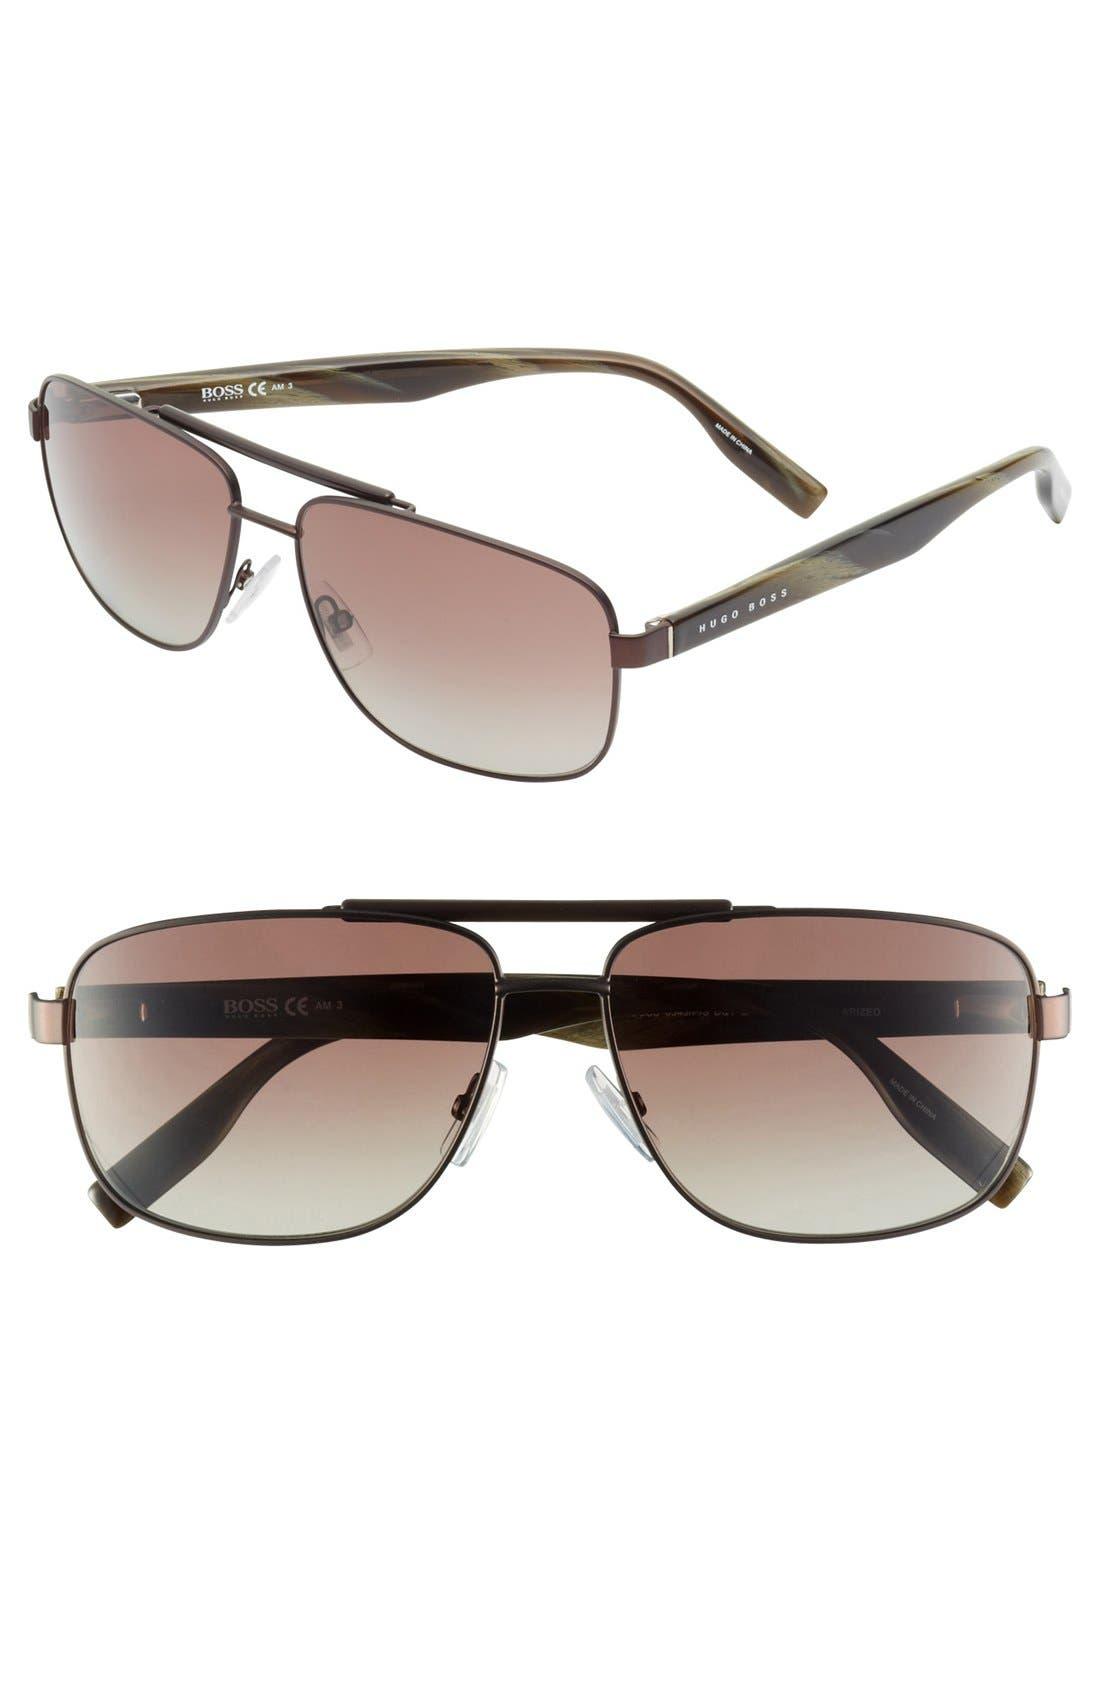 Main Image - BOSS HUGO BOSS 59mm Polarized Aviator Sunglasses